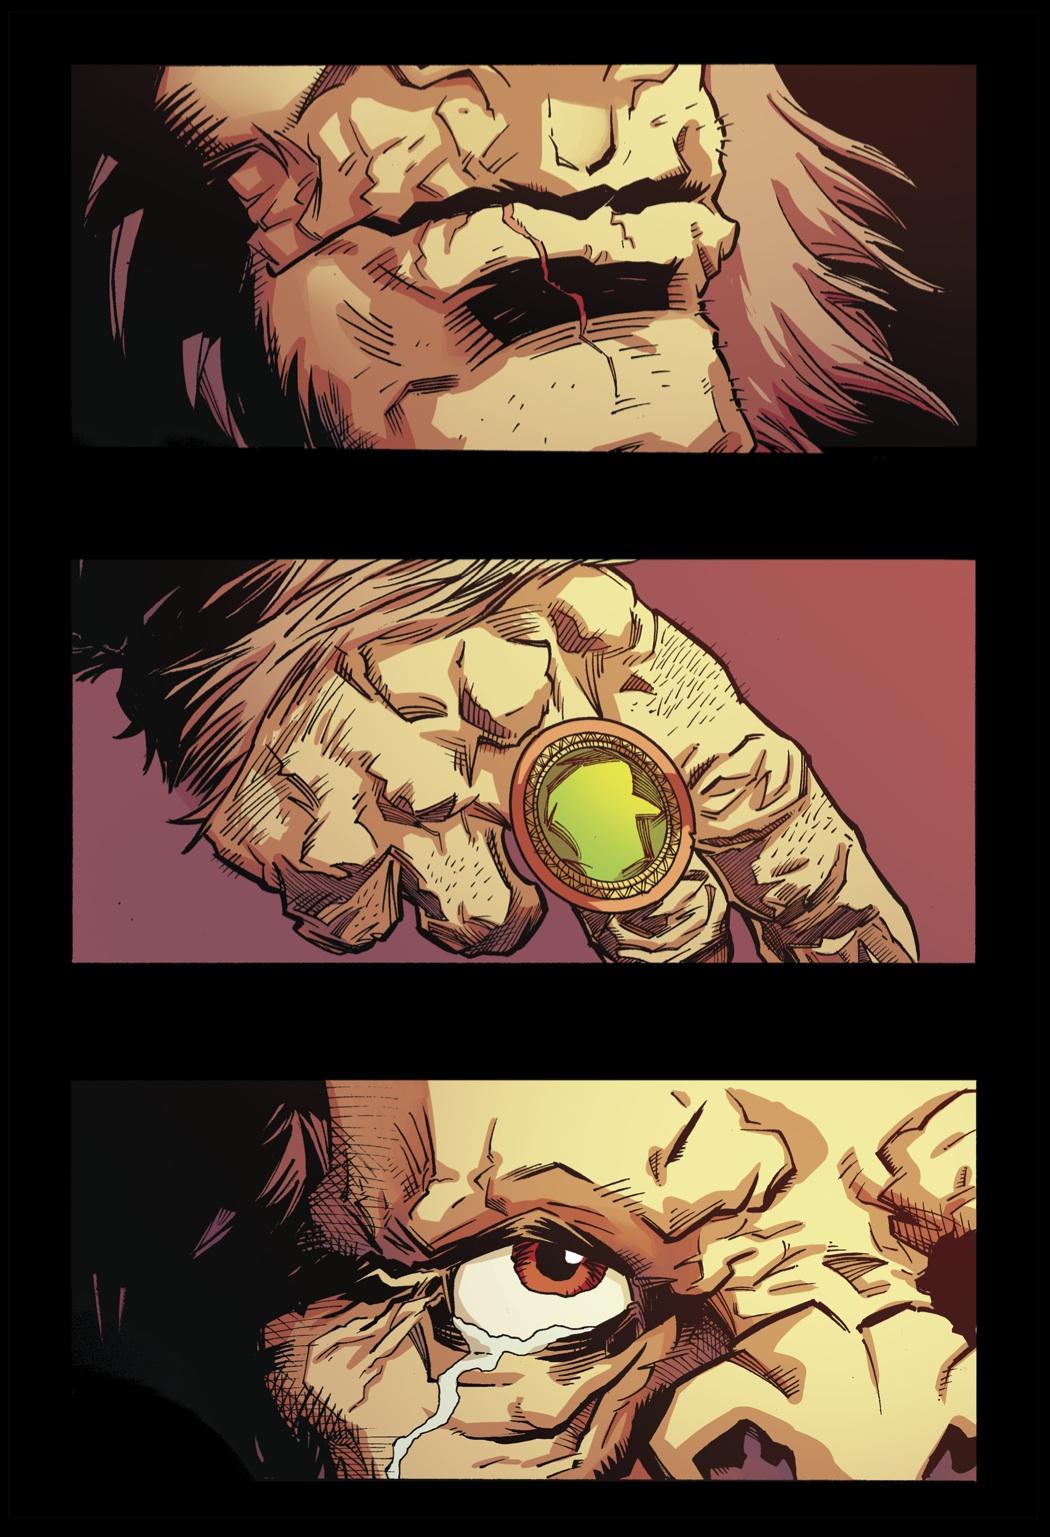 Bigfoot - Sword of the Earthman: Bigfoot comic book sword ...Bigfoot Comic